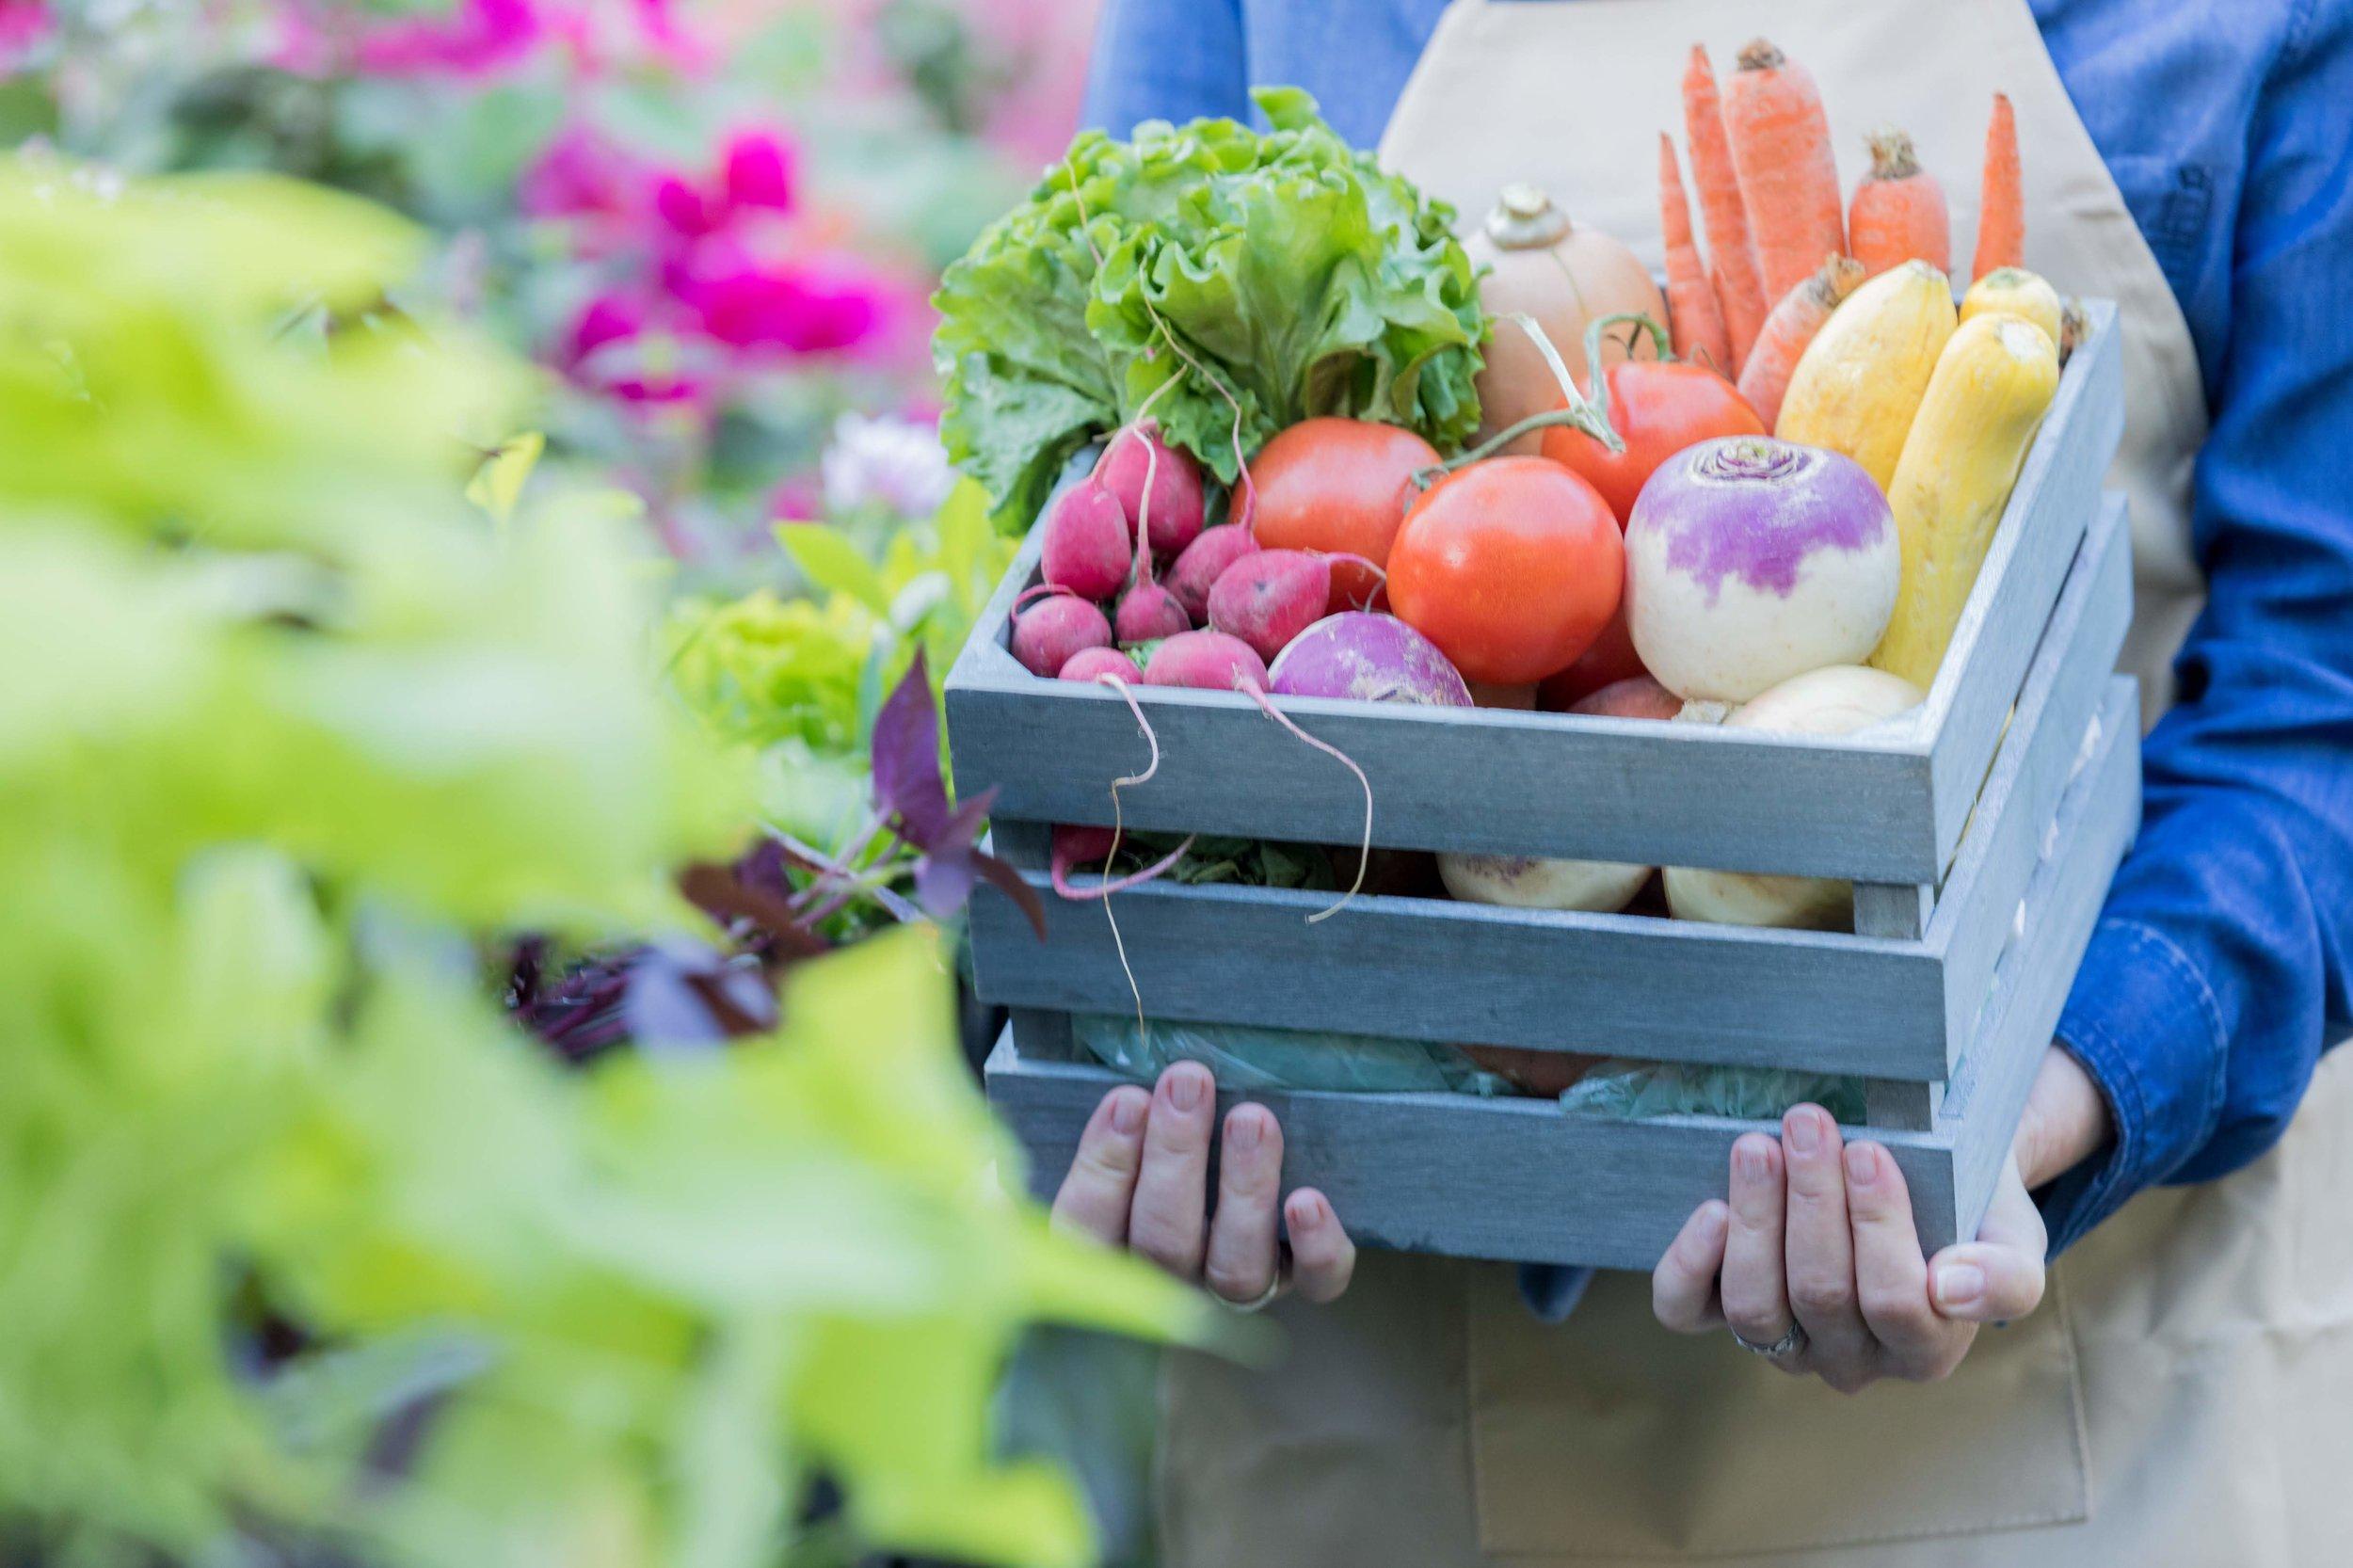 Unrecognizable-woman-holds-basket-of-fresh-veggies-904696968_6720x4480.jpg